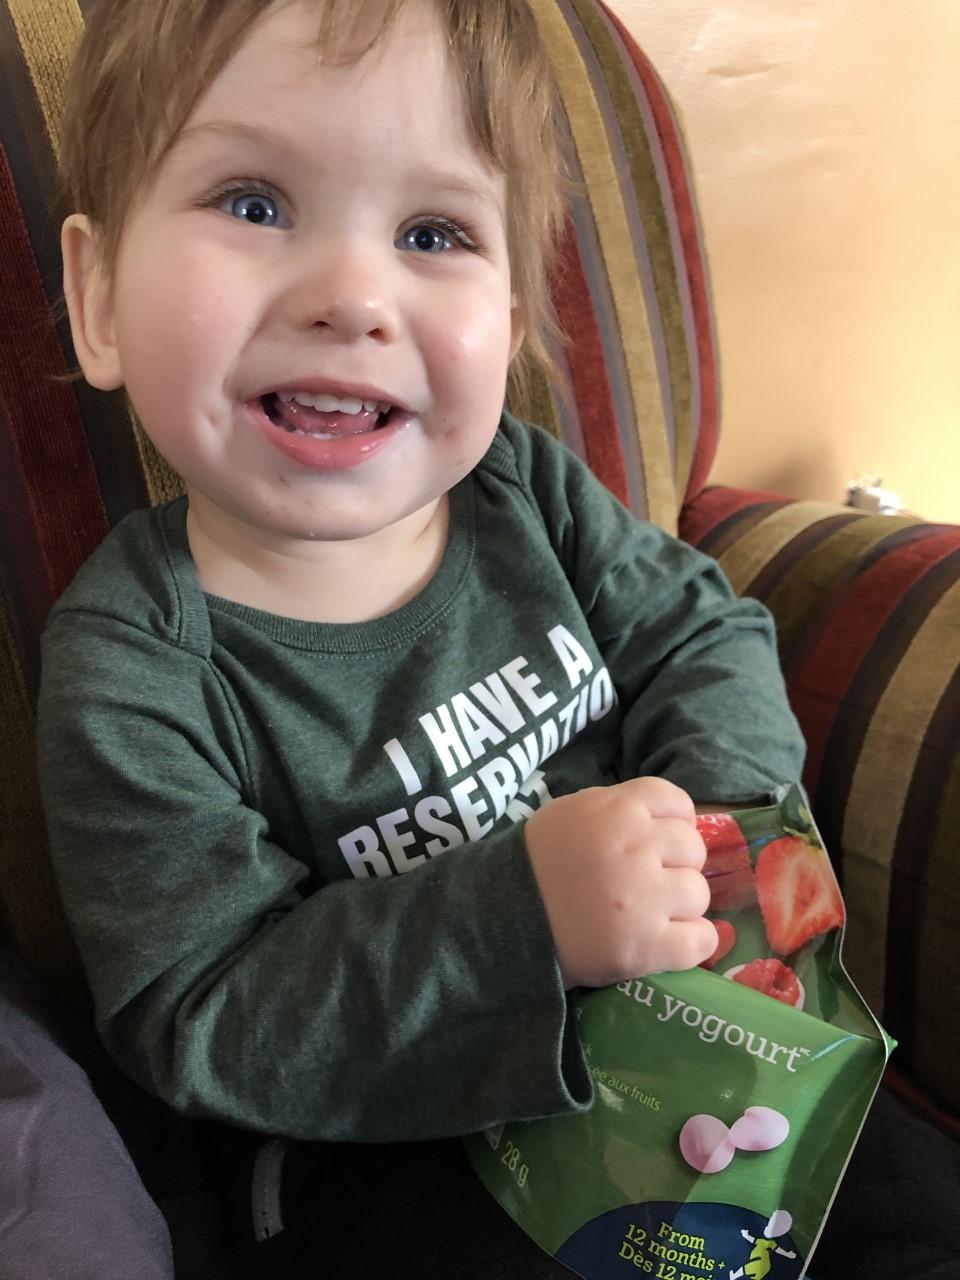 Everett, a happy, little boy.